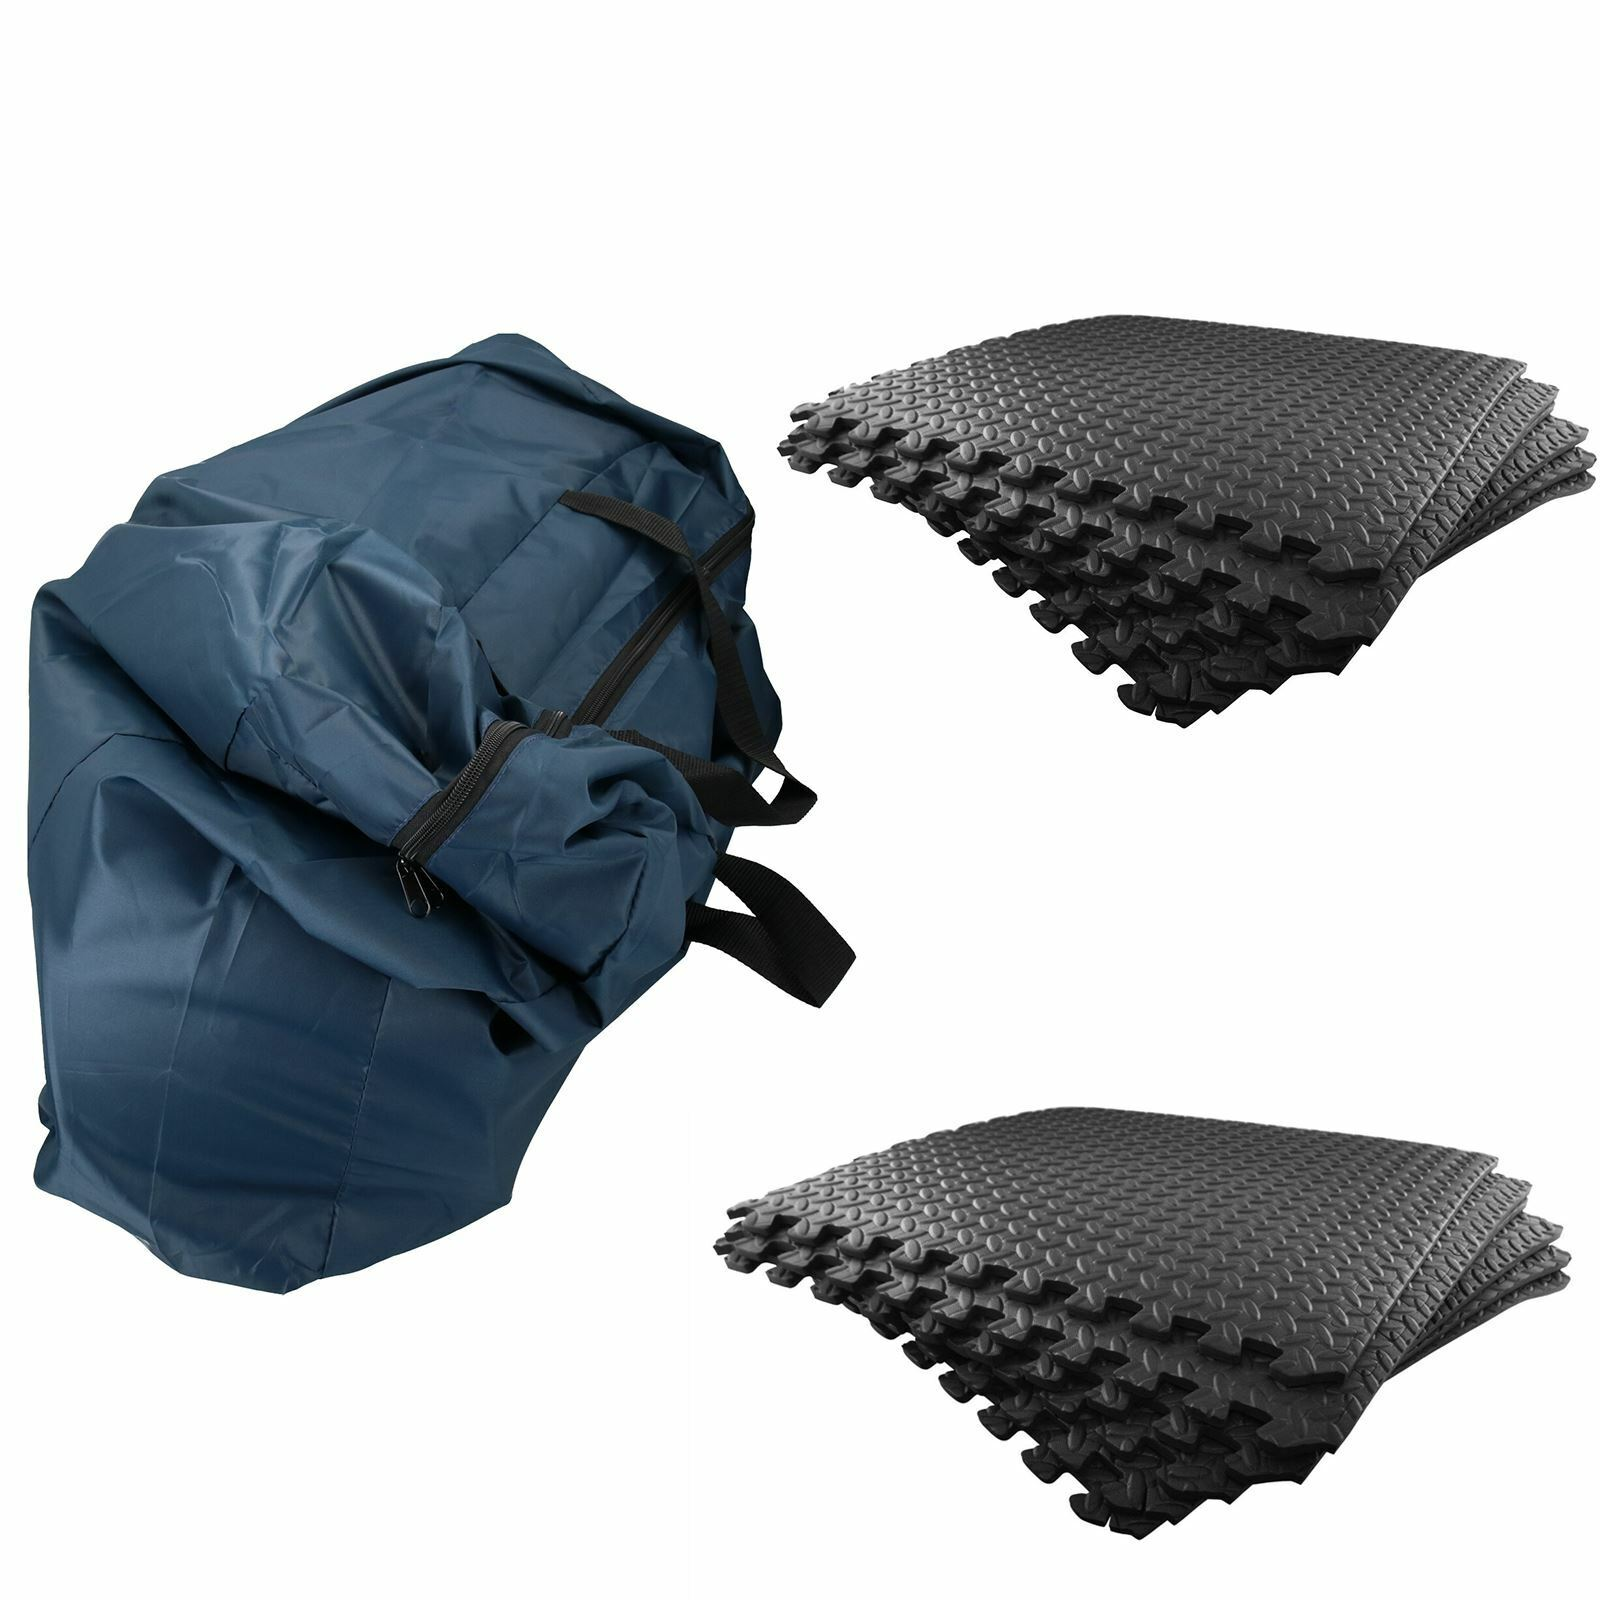 12pk 620mm Caravan Awning / Tent Foam Luxury Flooring Tiles & Storage Bag